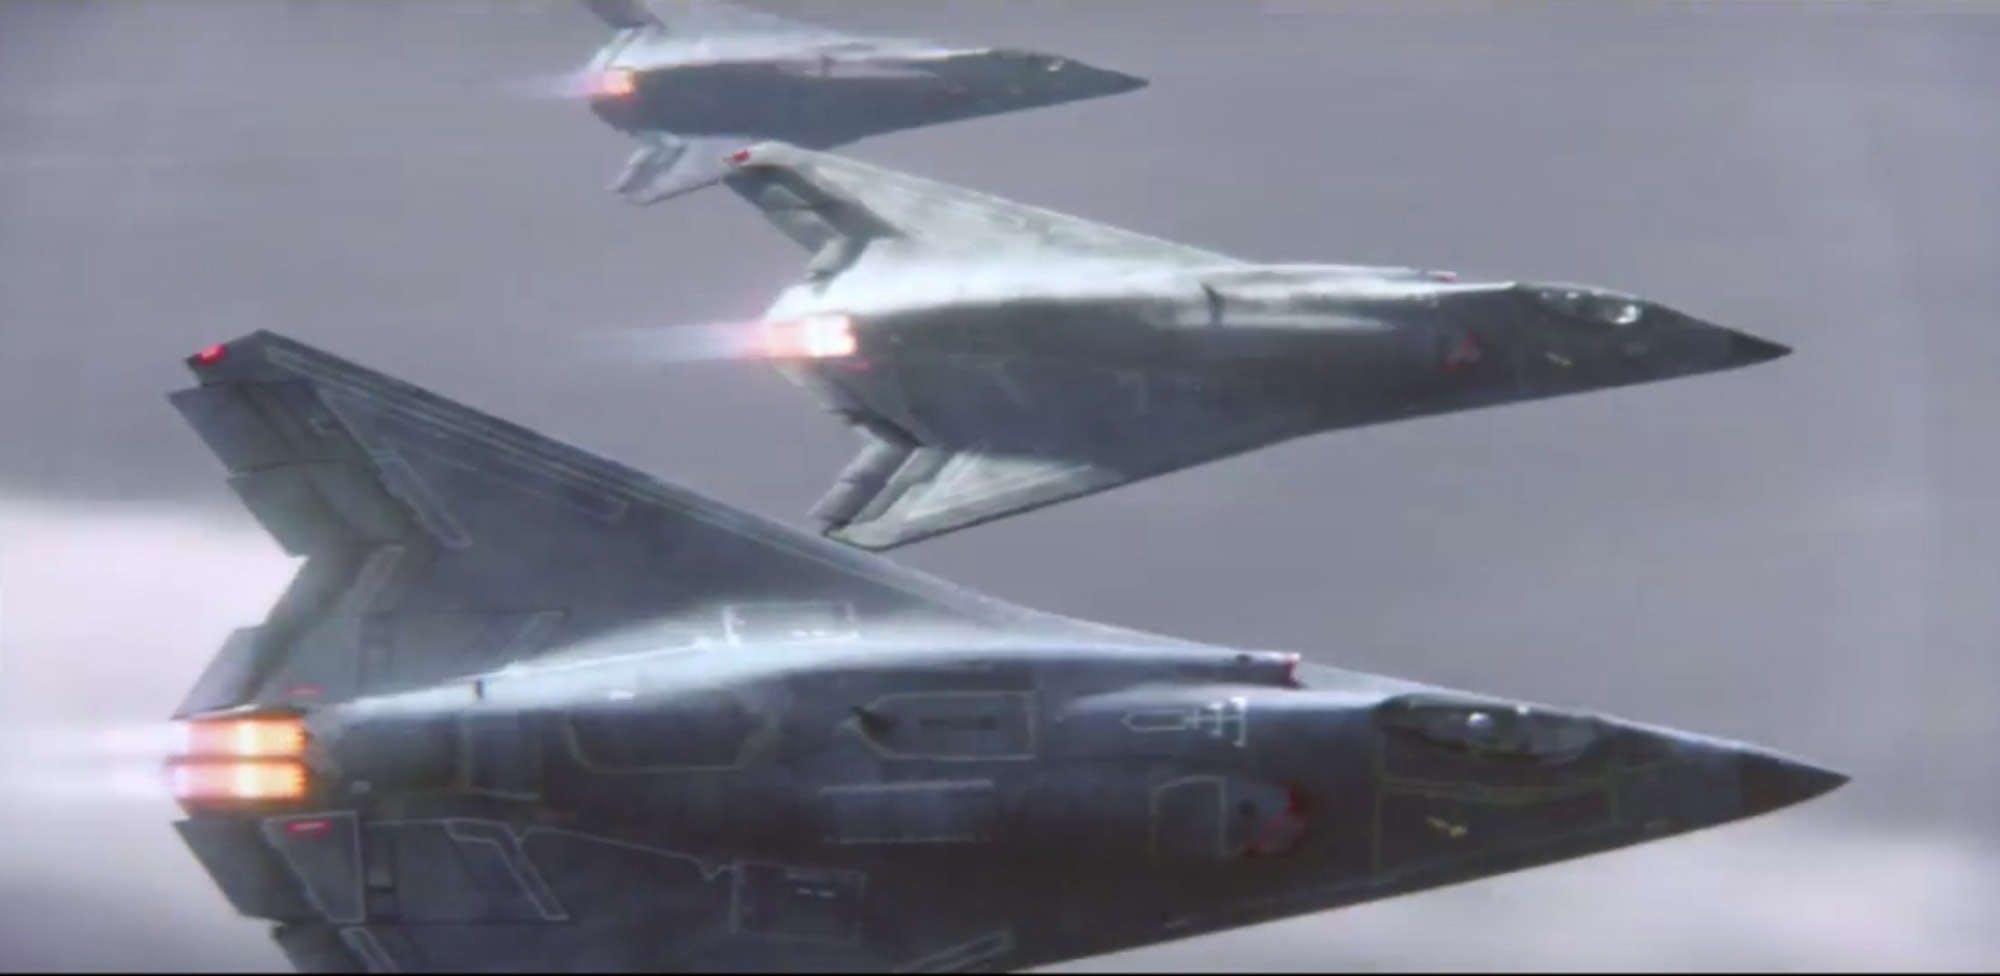 northrop grumman teases 6th generation fighter